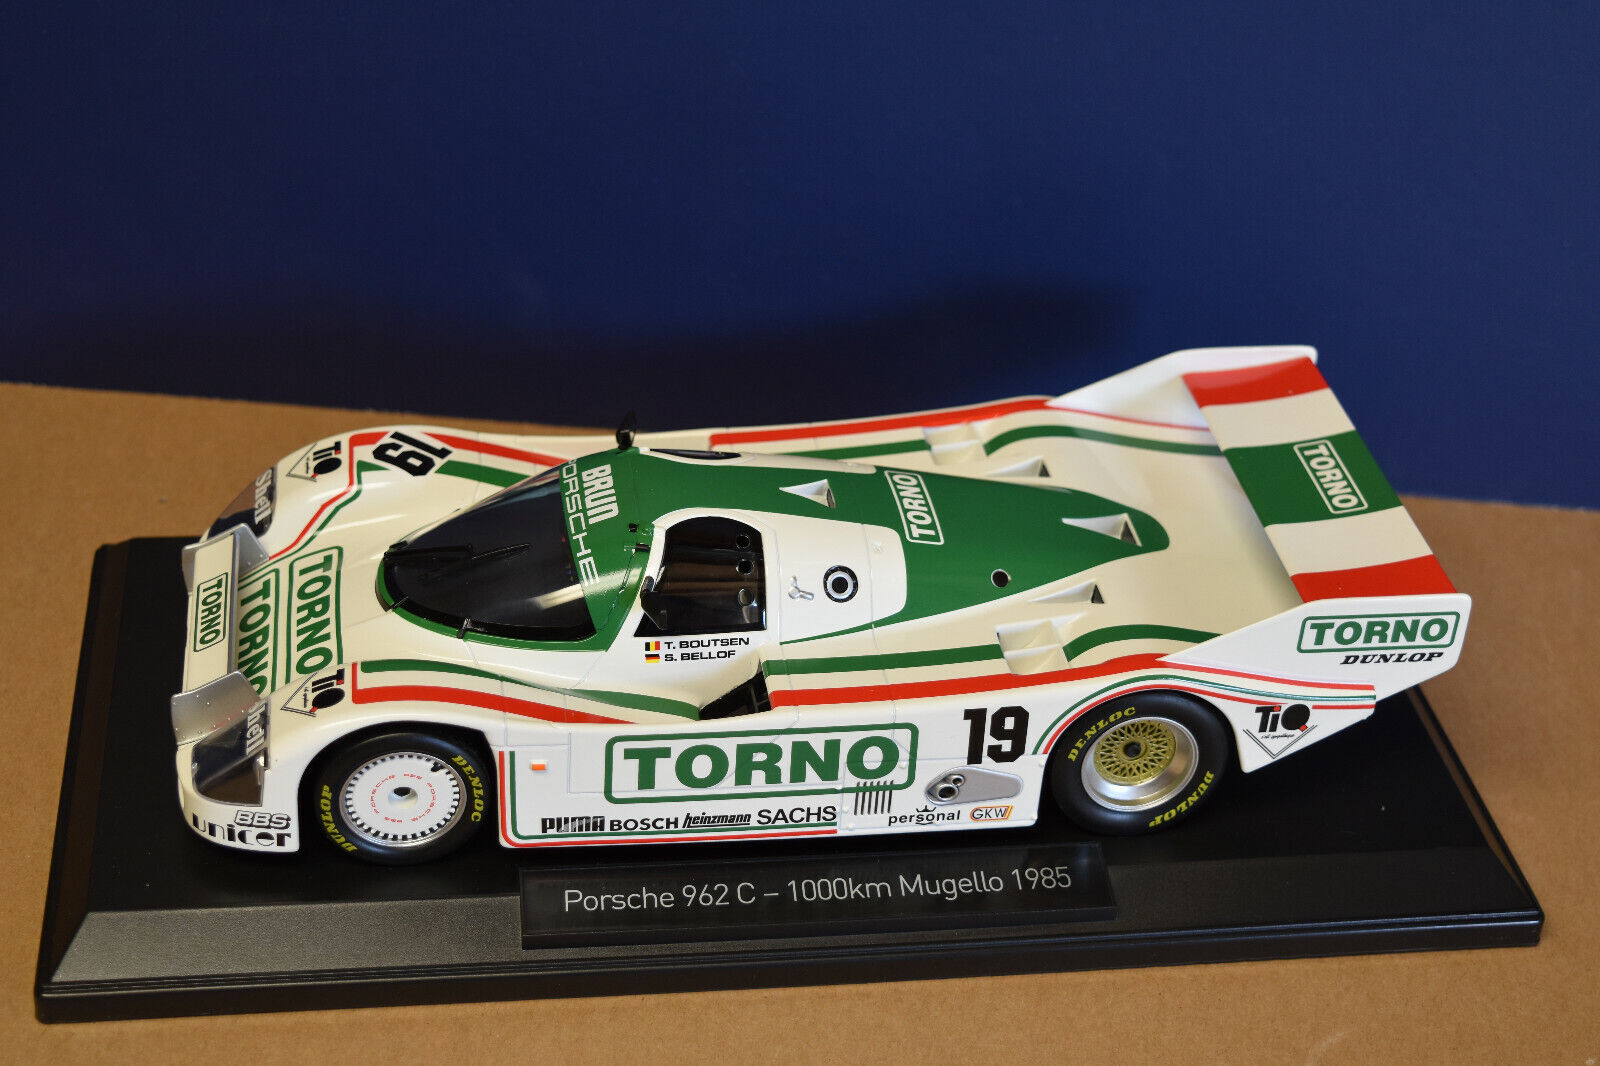 Norev 1 18 Porsche 962 C  Torno  - 1000km Mugello S. Bellof (1 of 1000 Pcs) NEW